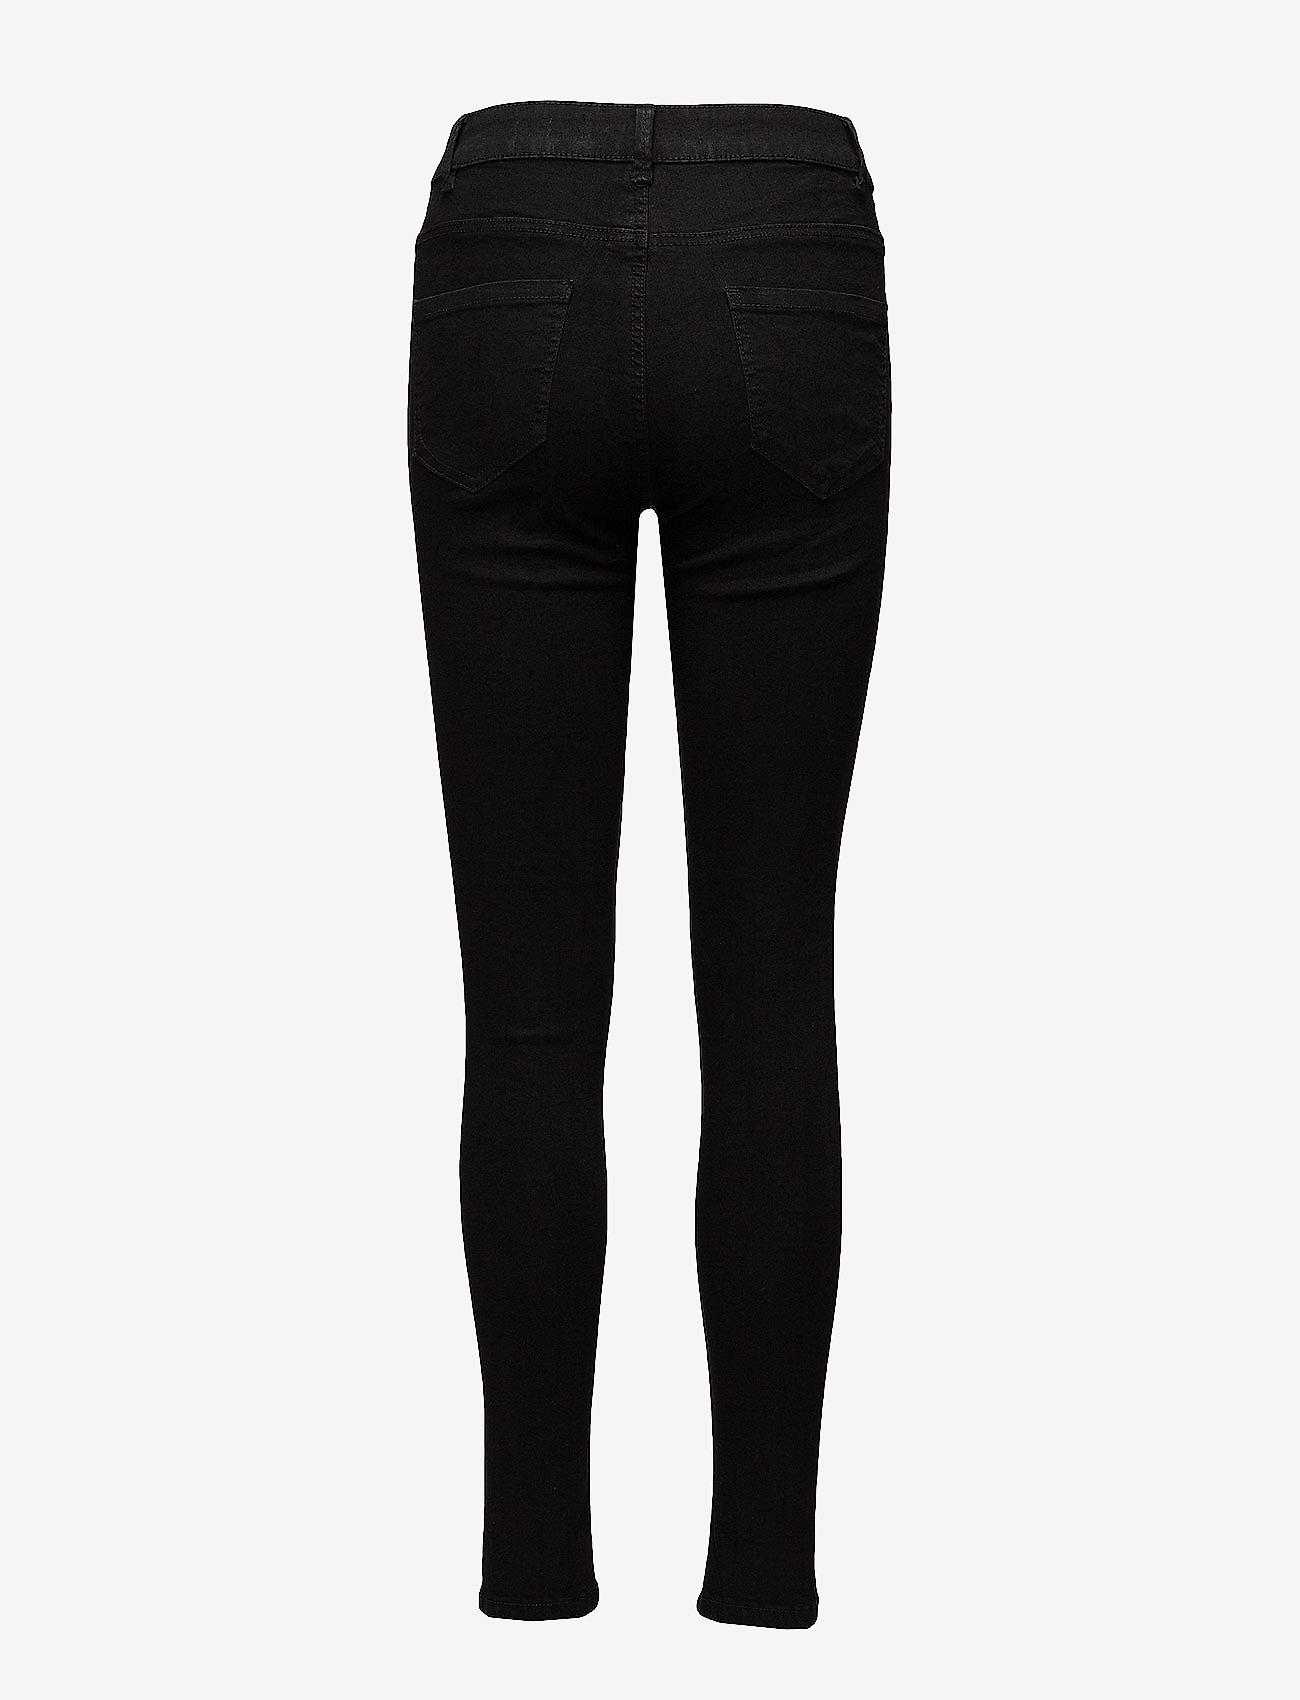 Saint Tropez - T5757, UllaSZ Jeans - skinny jeans - black - 2